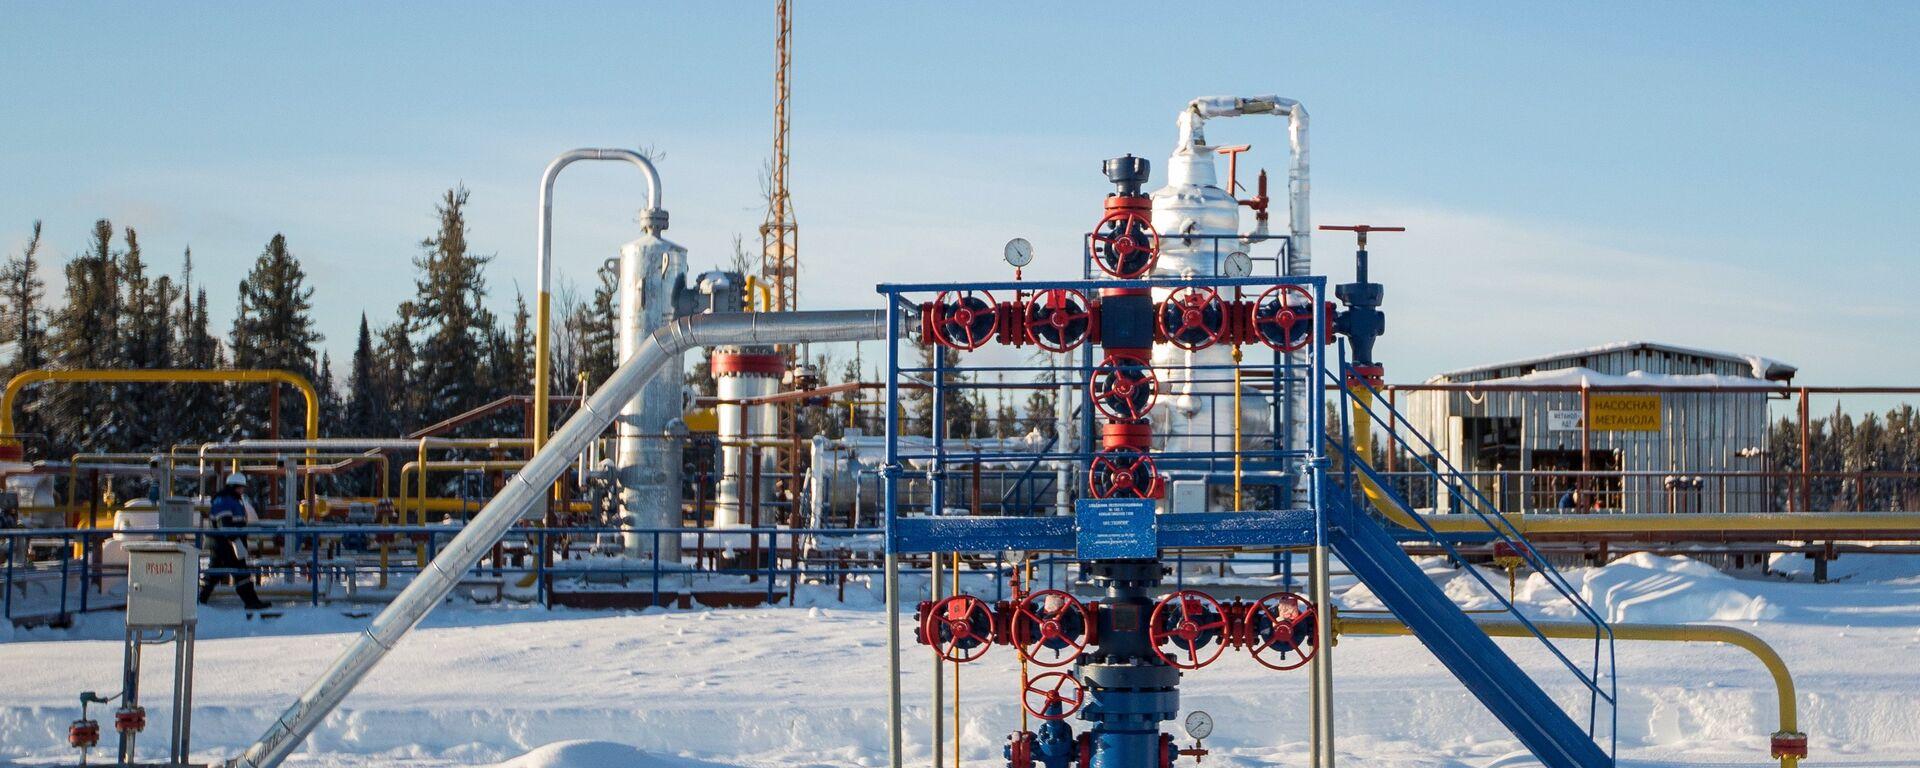 Un pozo de gas de la compañía Gazprom - Sputnik Mundo, 1920, 01.03.2021